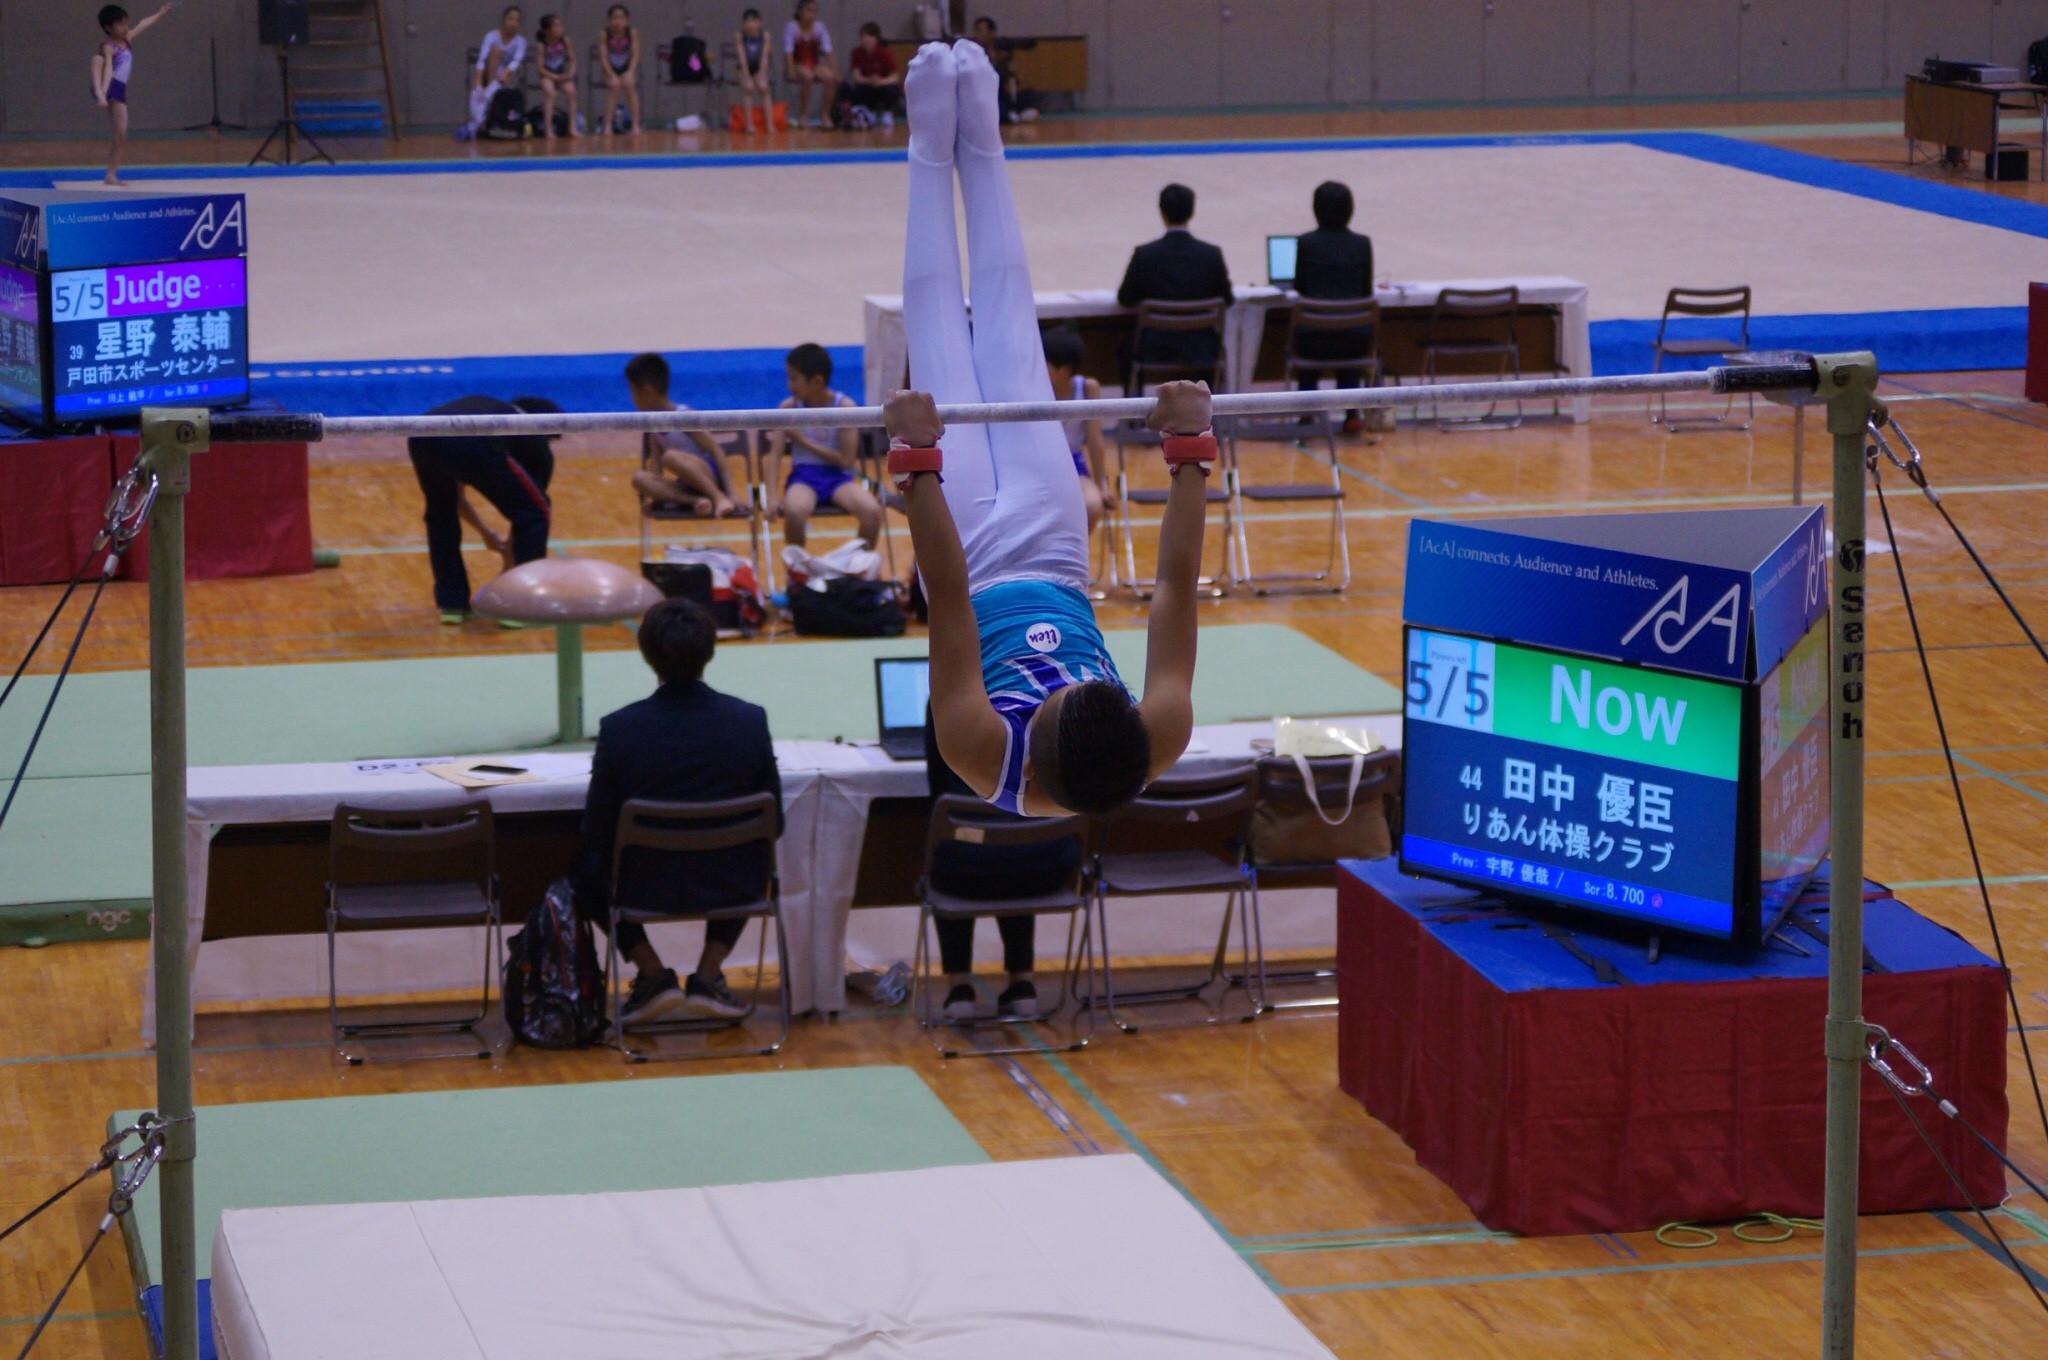 2019年AJG大会in三重県画像21